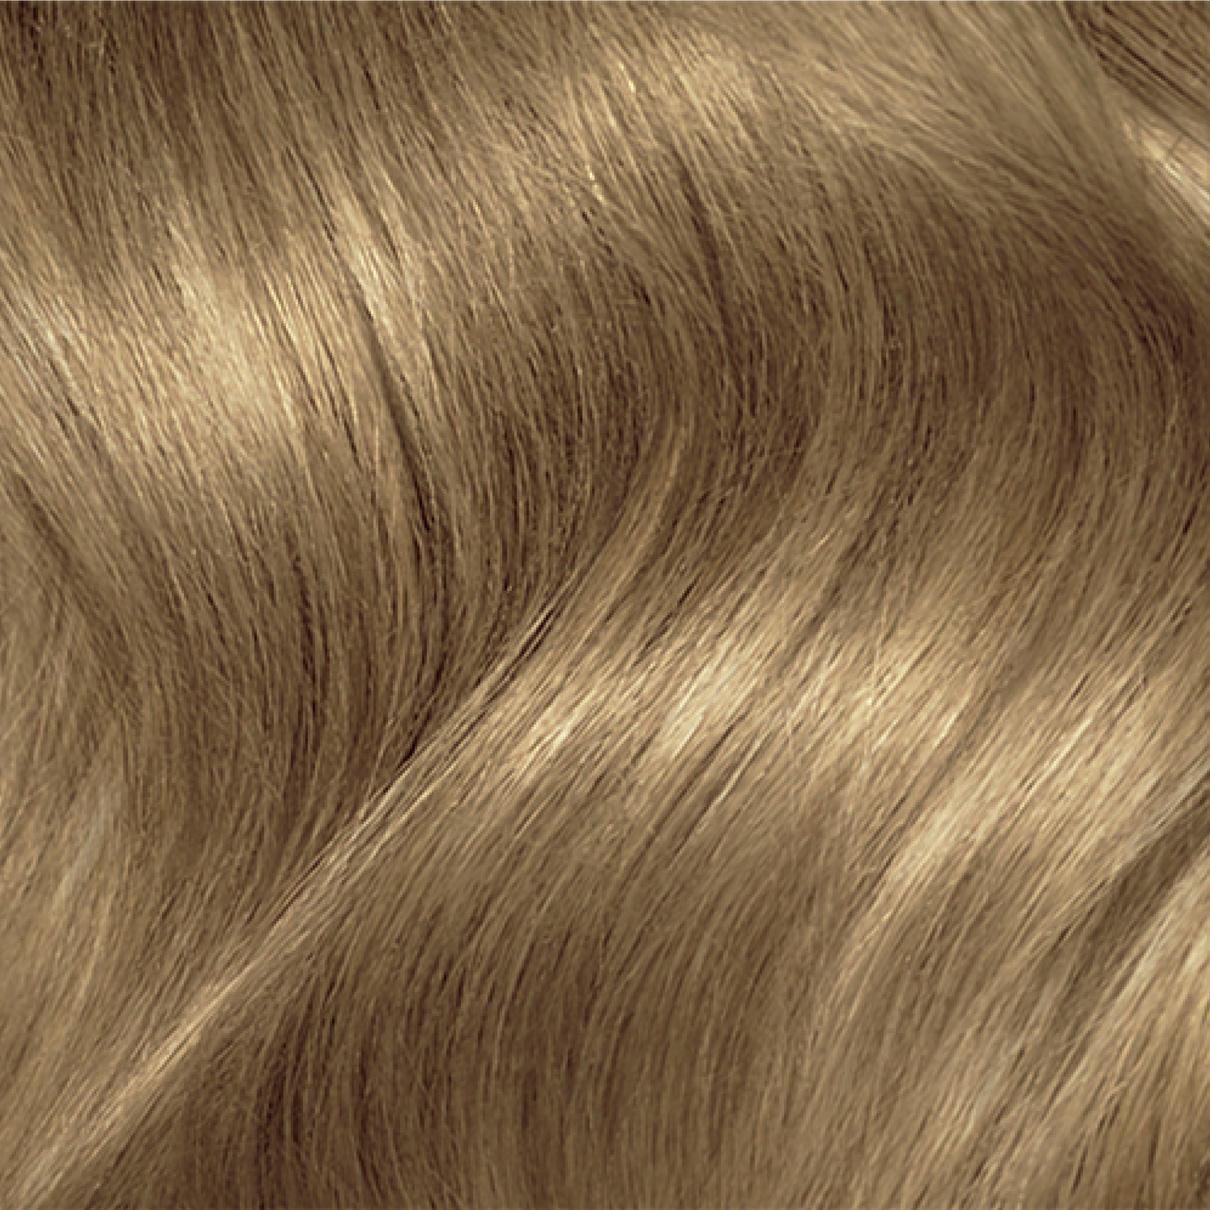 Permanent hair color clairol nice n easy 8a medium ash blonde nvjuhfo Gallery